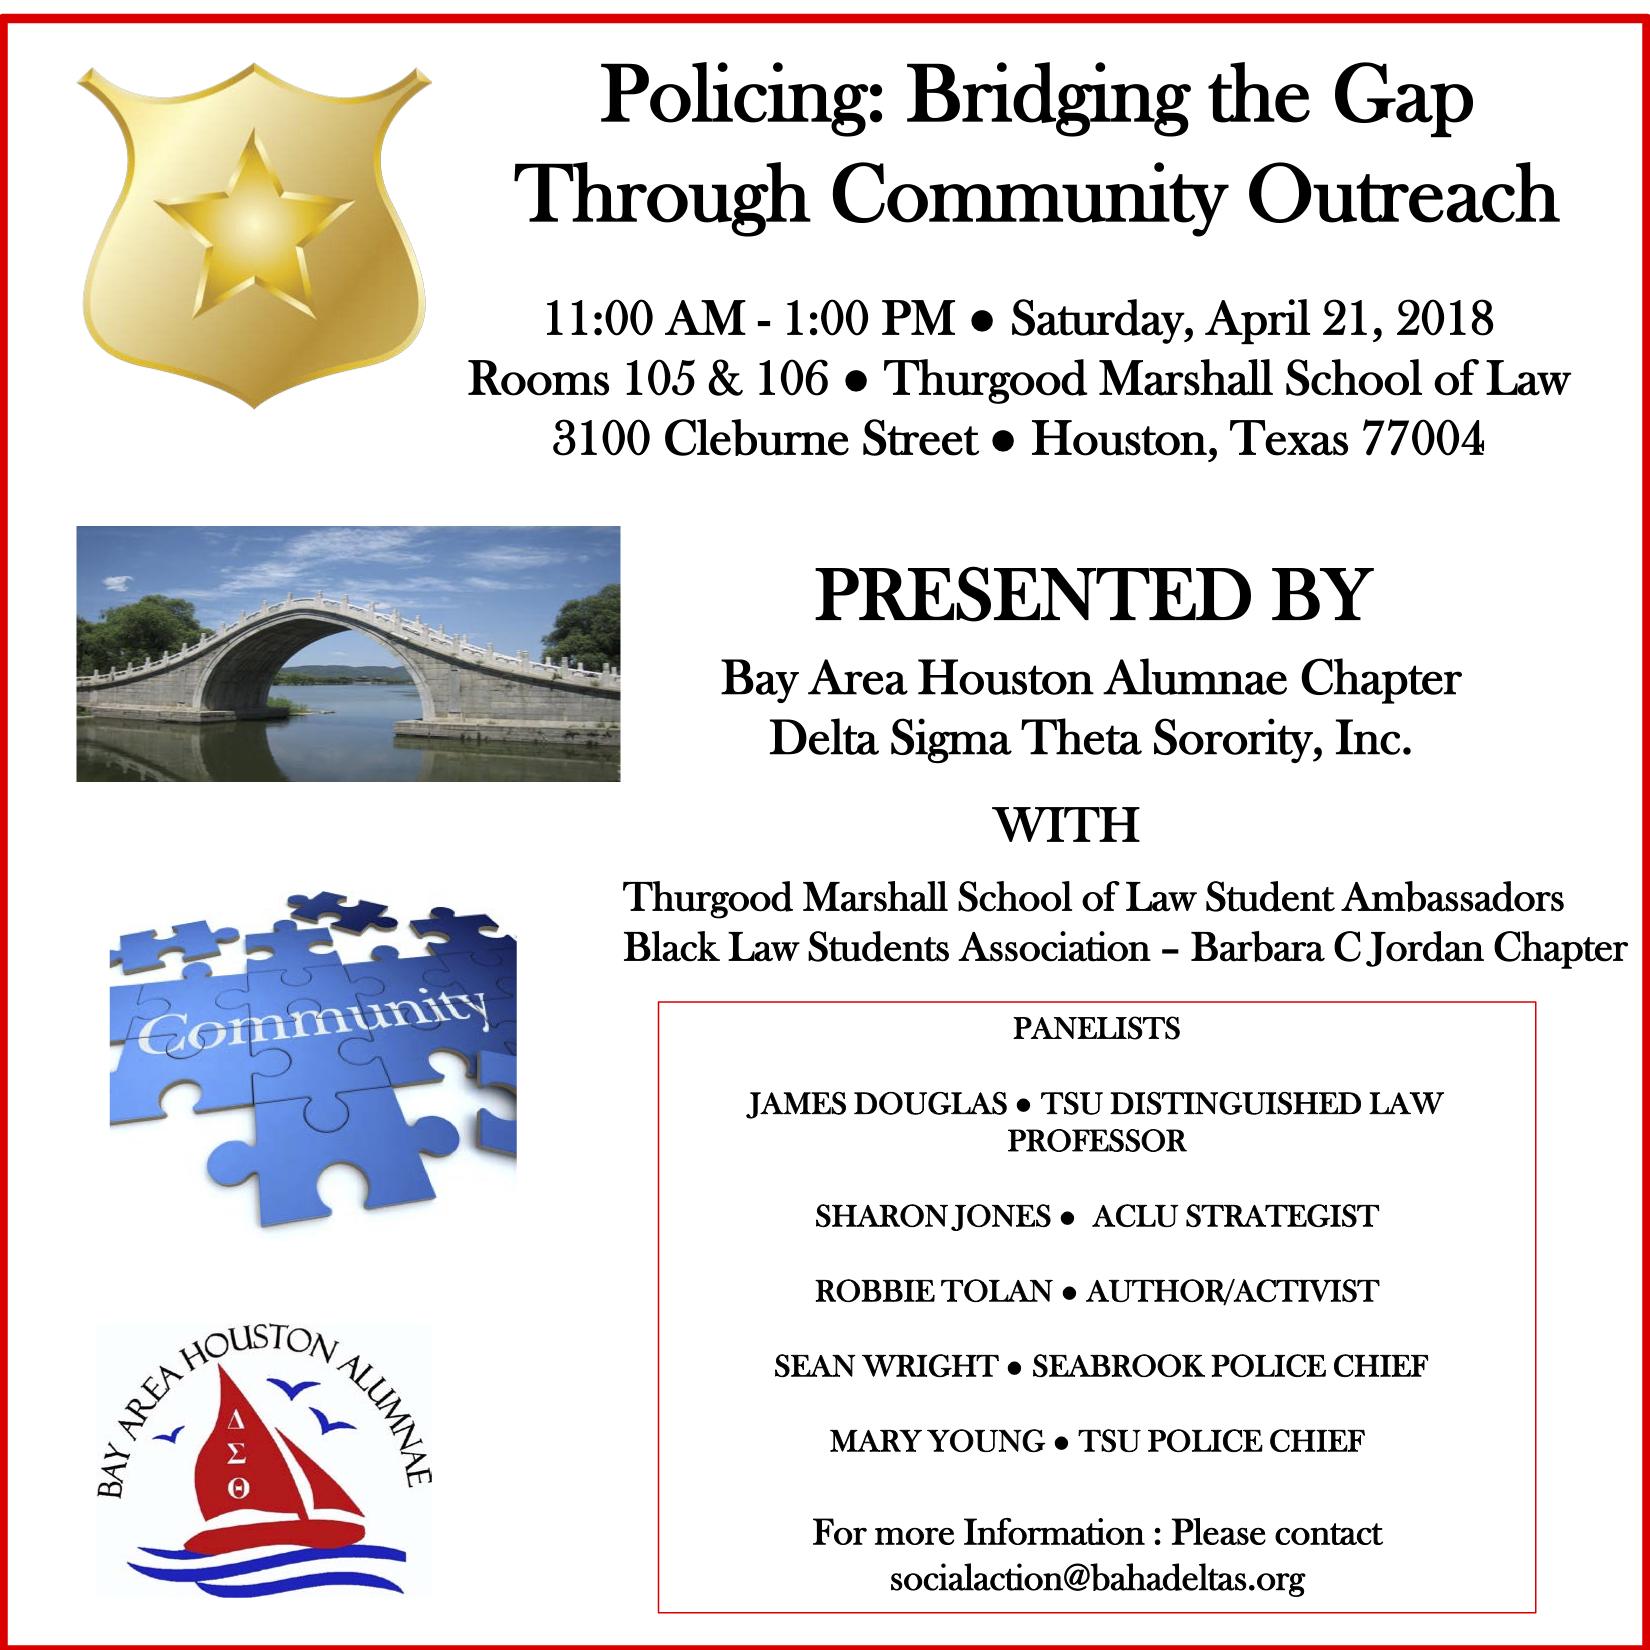 Policing: Bridging the Gap Through Community Outreach